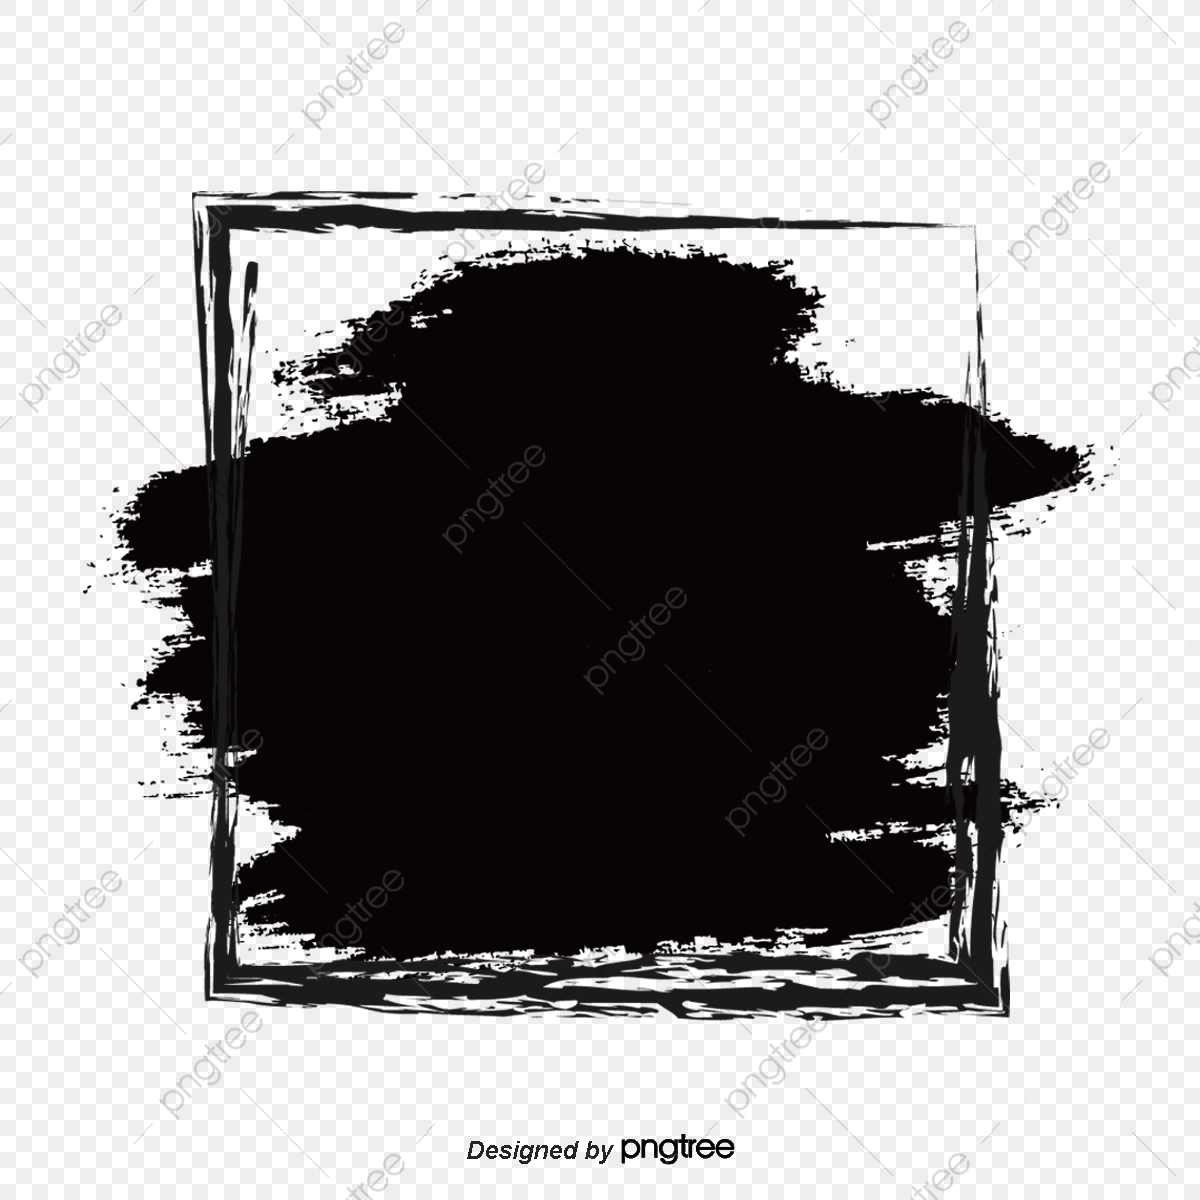 Black Graffiti With Ink Splashing Border Spatter Splashing Ink Doodling Png Transparent Clipart Image And Psd File For Free Download